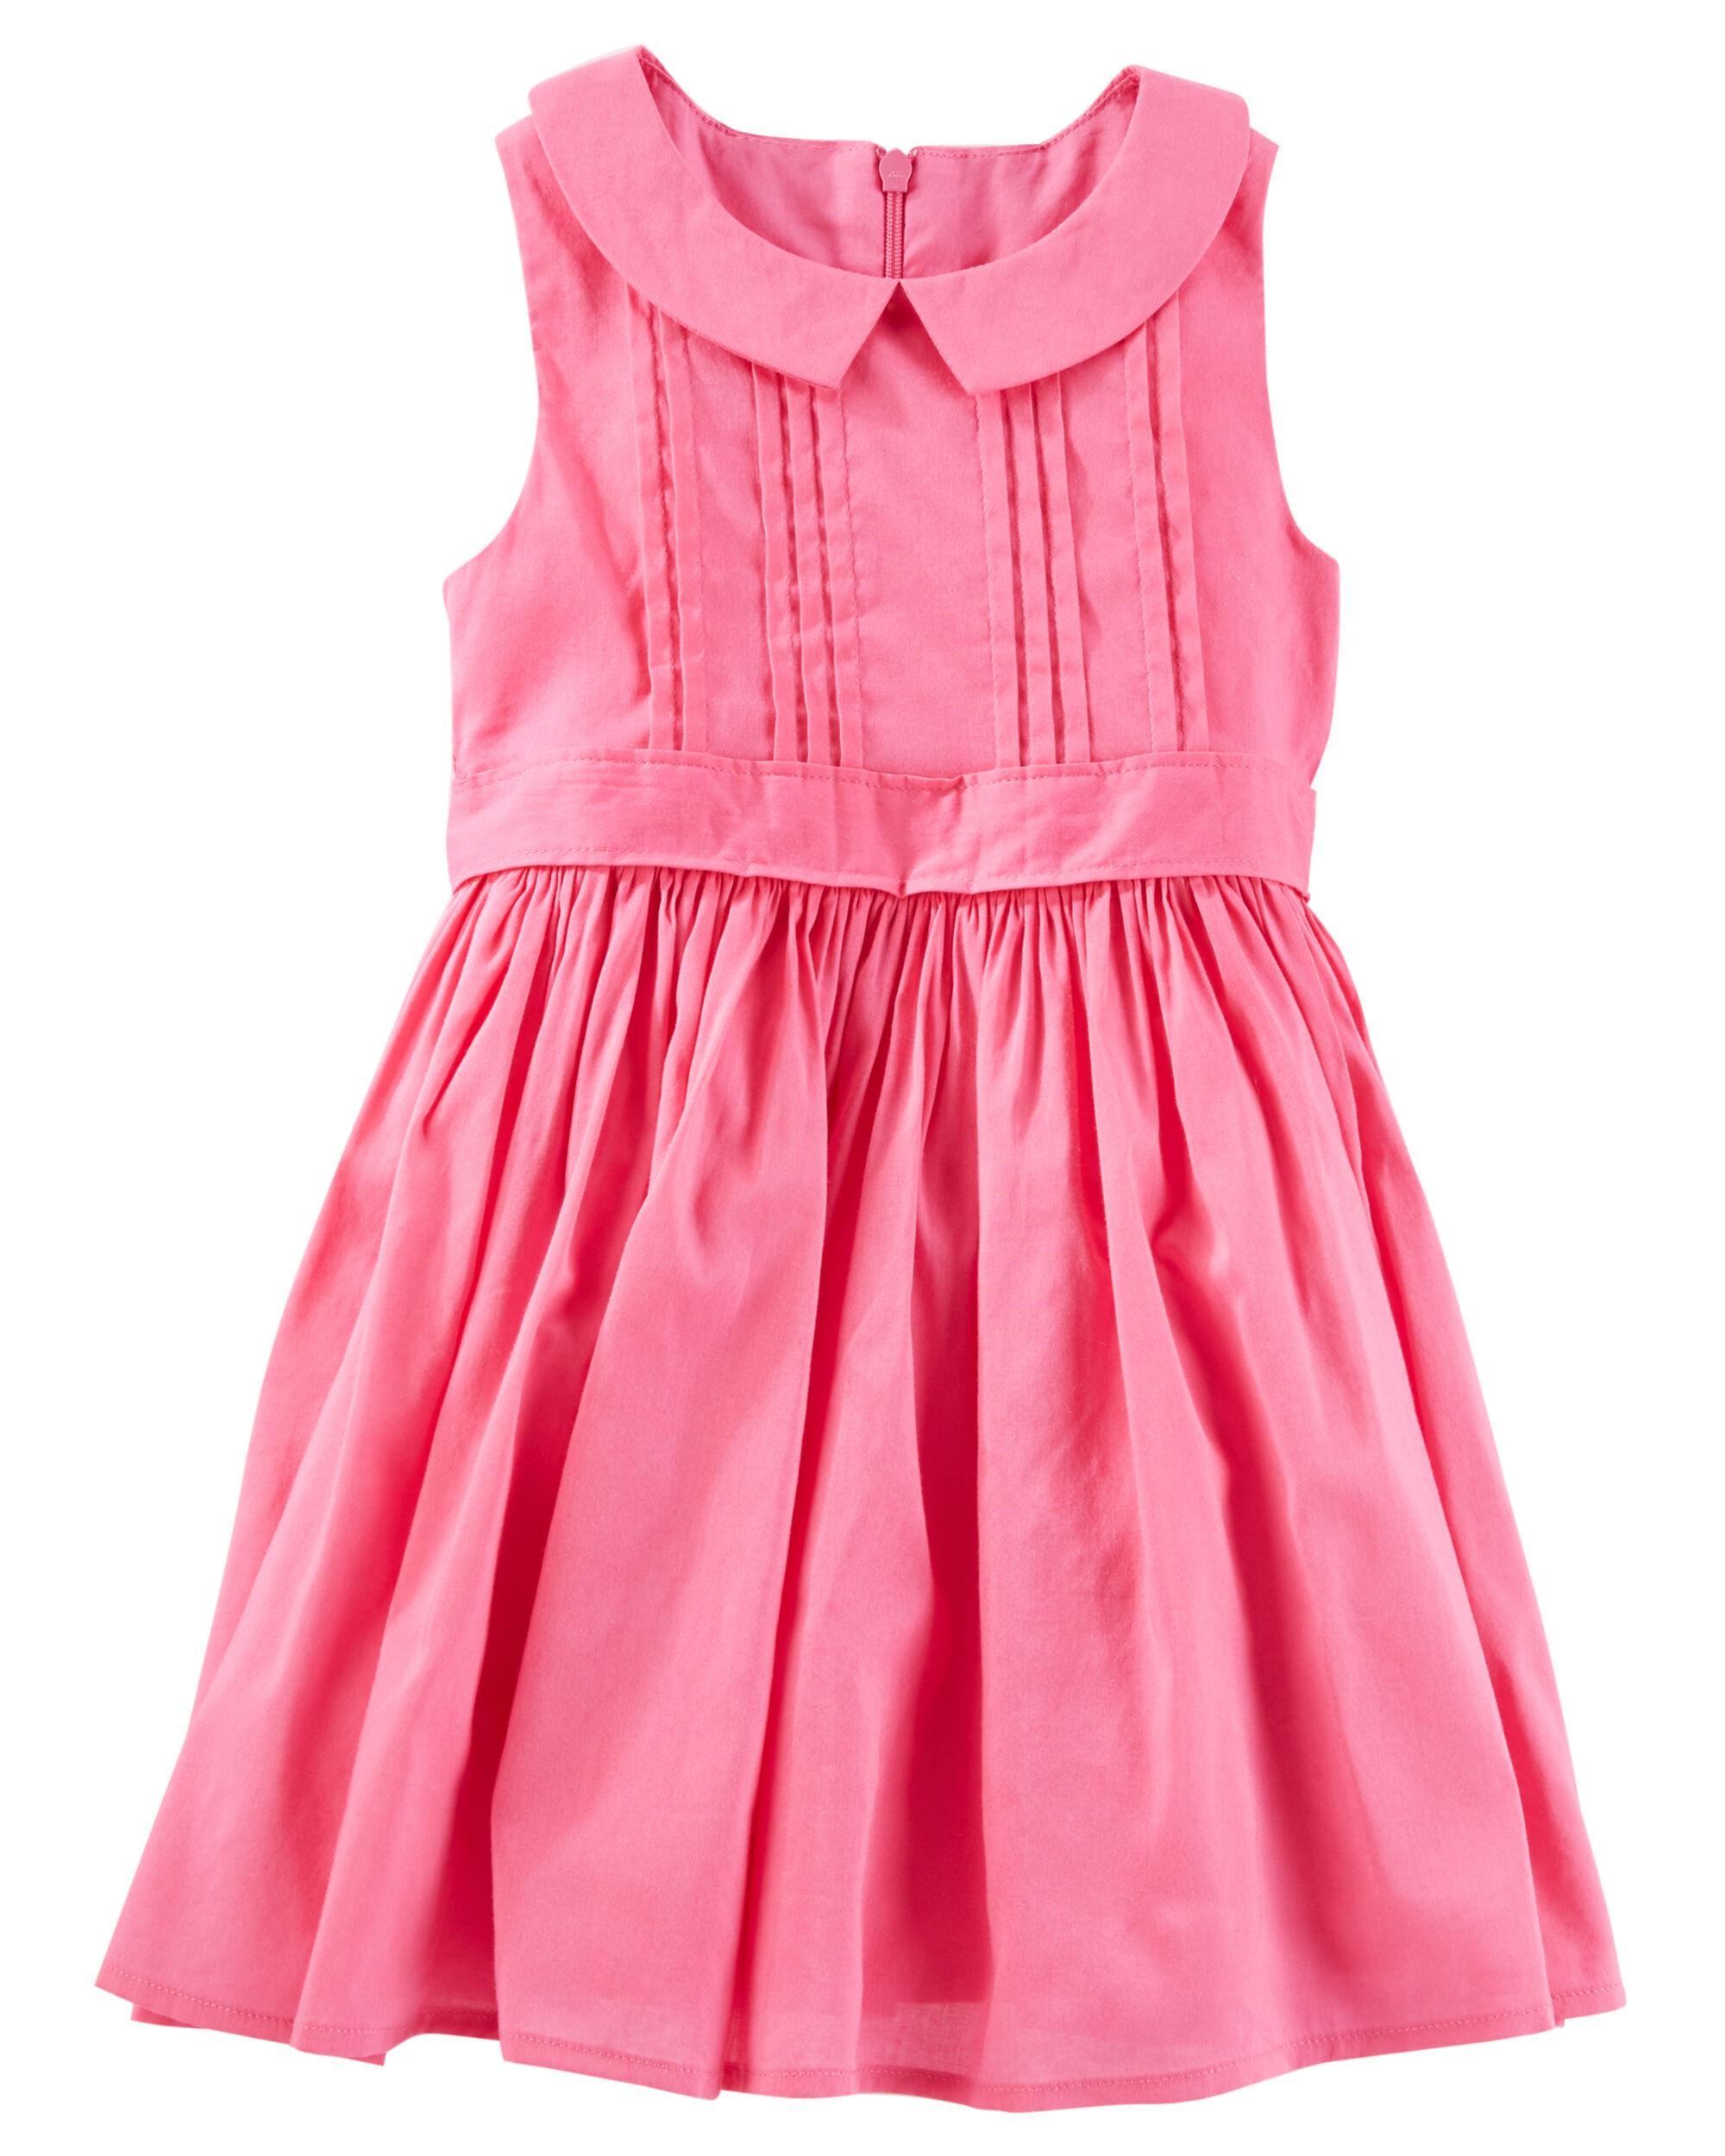 Pleated Peter Pan Collar Dress | OshKosh.com